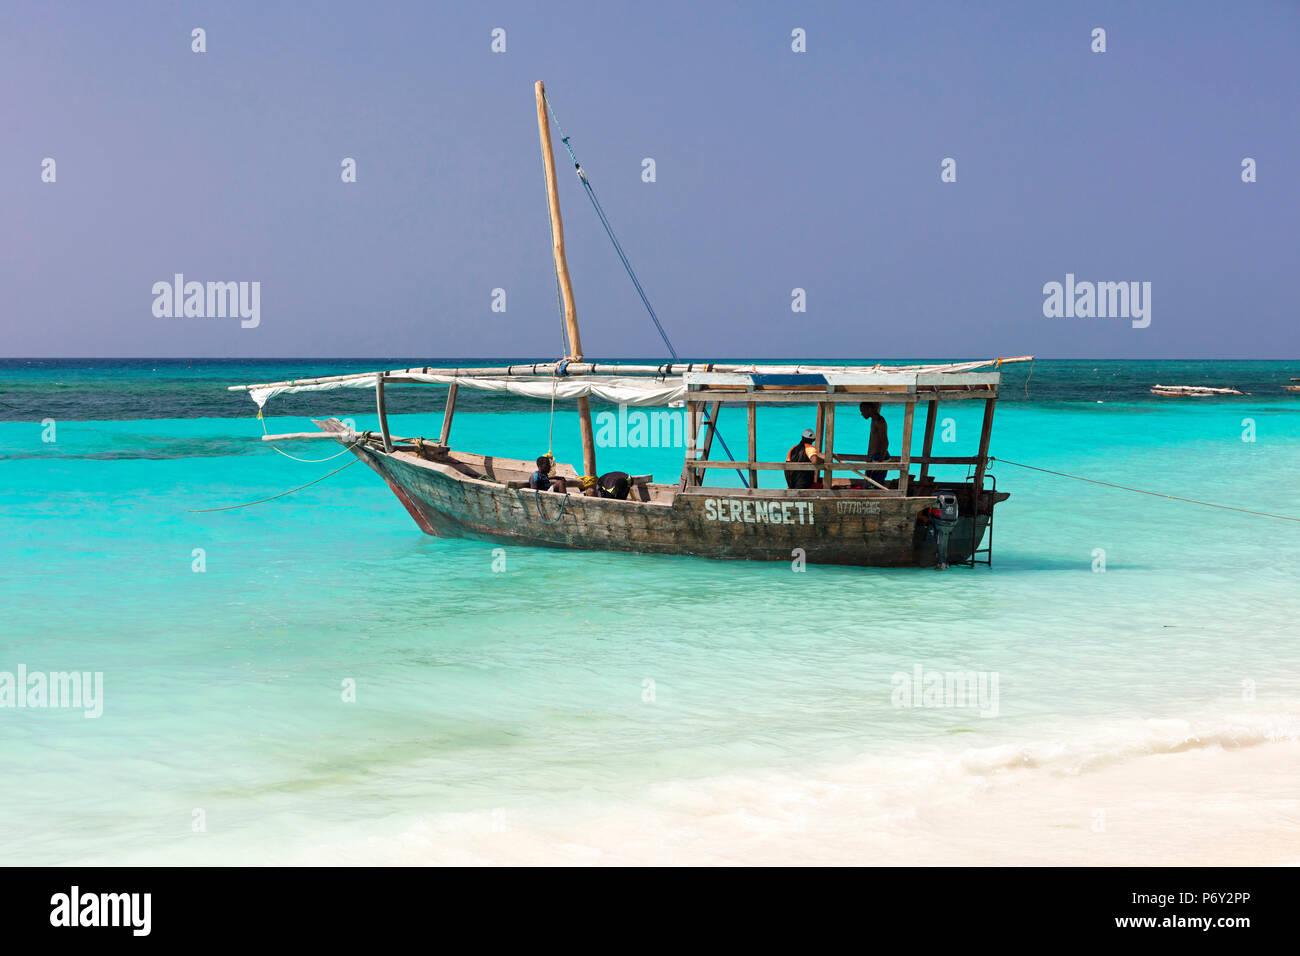 A traditional dhow is moored at Nugwi beach, Zanzibar, Tanzania - Stock Image